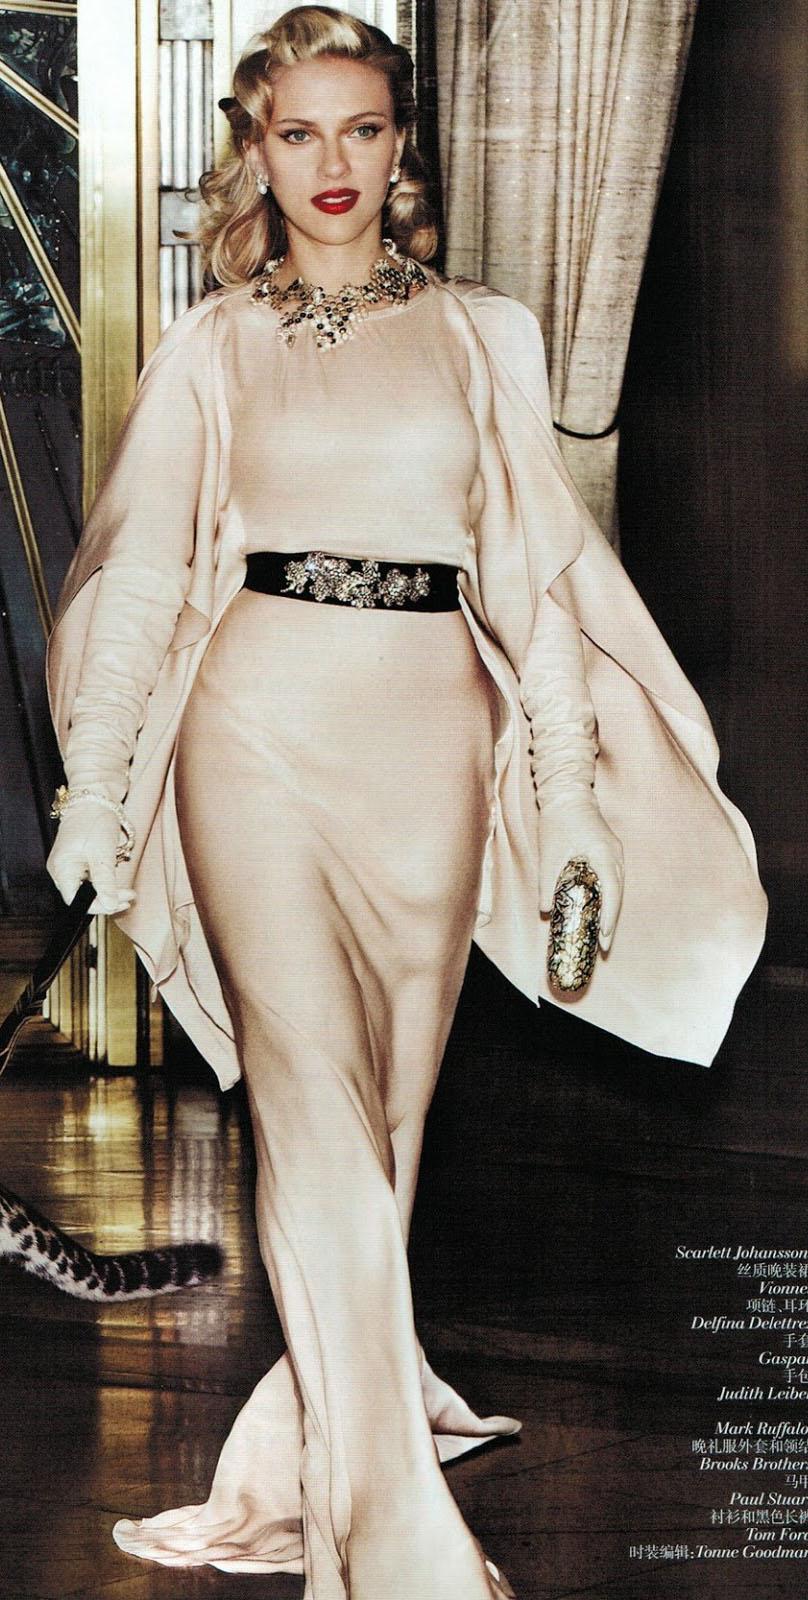 celebrity-scarlettjohansson-bombshell-sexy-style-type-ivory-white-silk-dress-belt-sash-gloves-necklace-blonde-gown.jpg